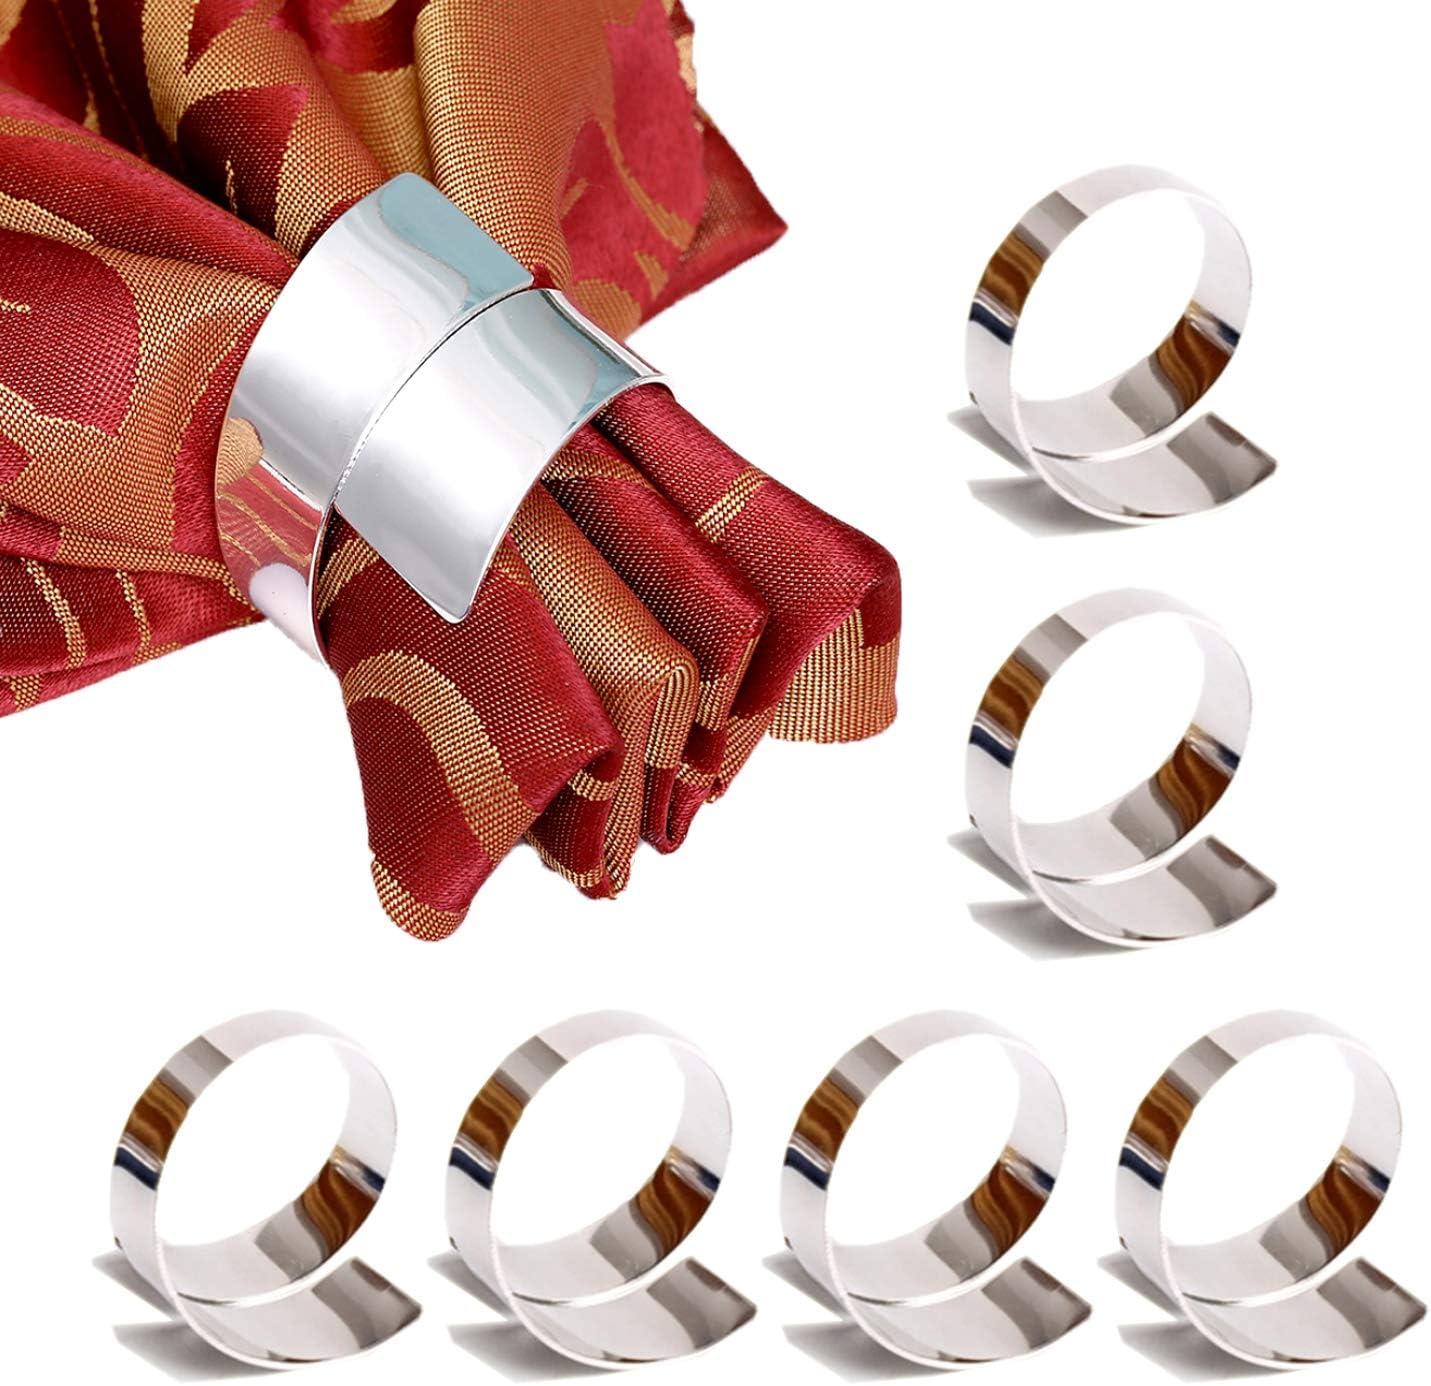 Getfitsoo Napkin Ring,Napkin Holder for Wedding Christmas Party Dinner Table Decor 6 Pcs (Geometric Silver Circle)